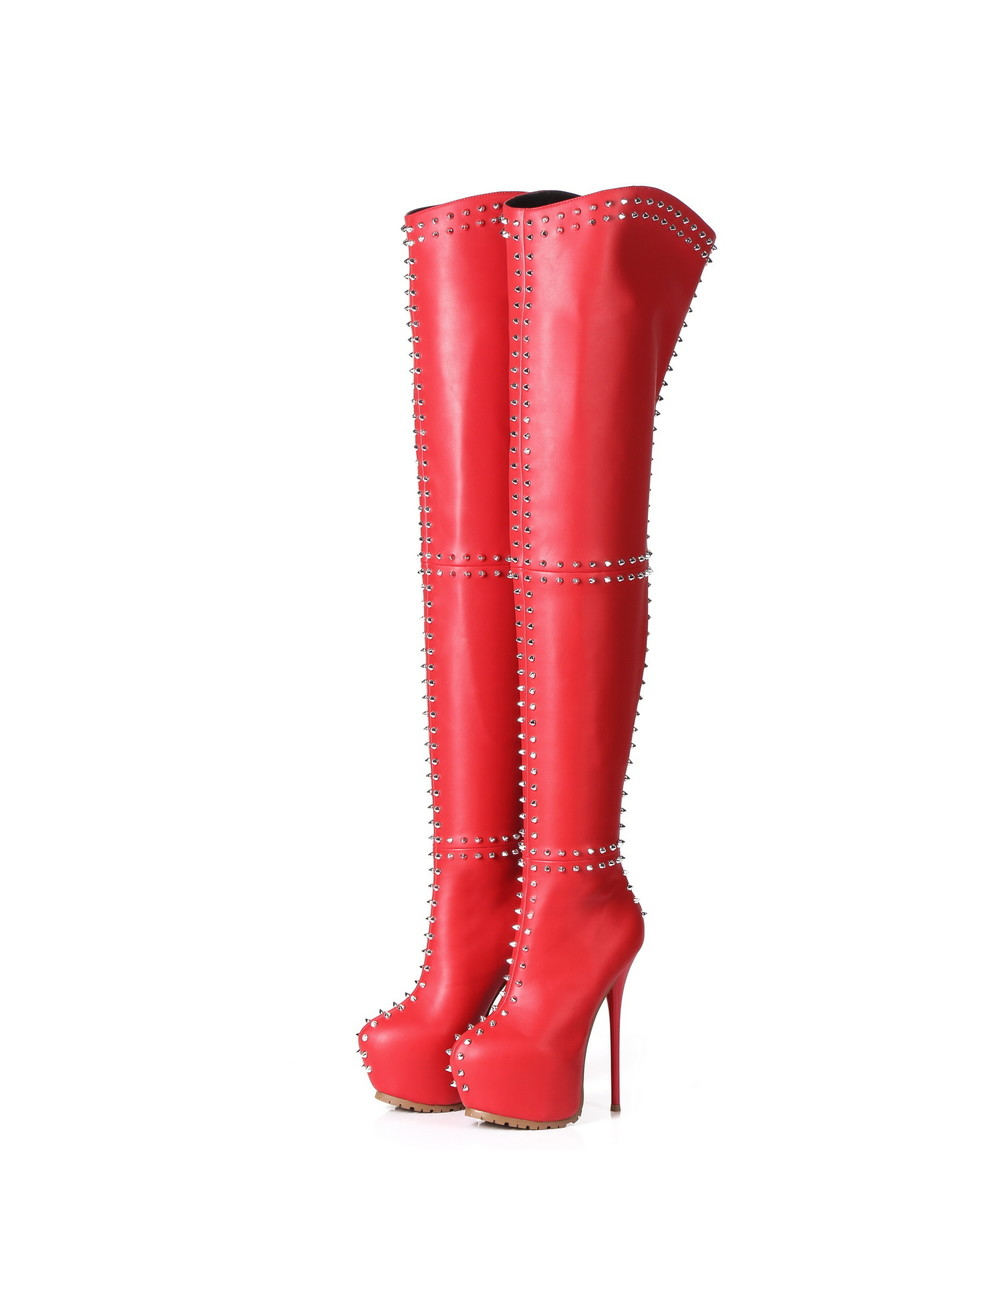 Giaro Giaro SOPHIA rood studded dijlaarzen profiel